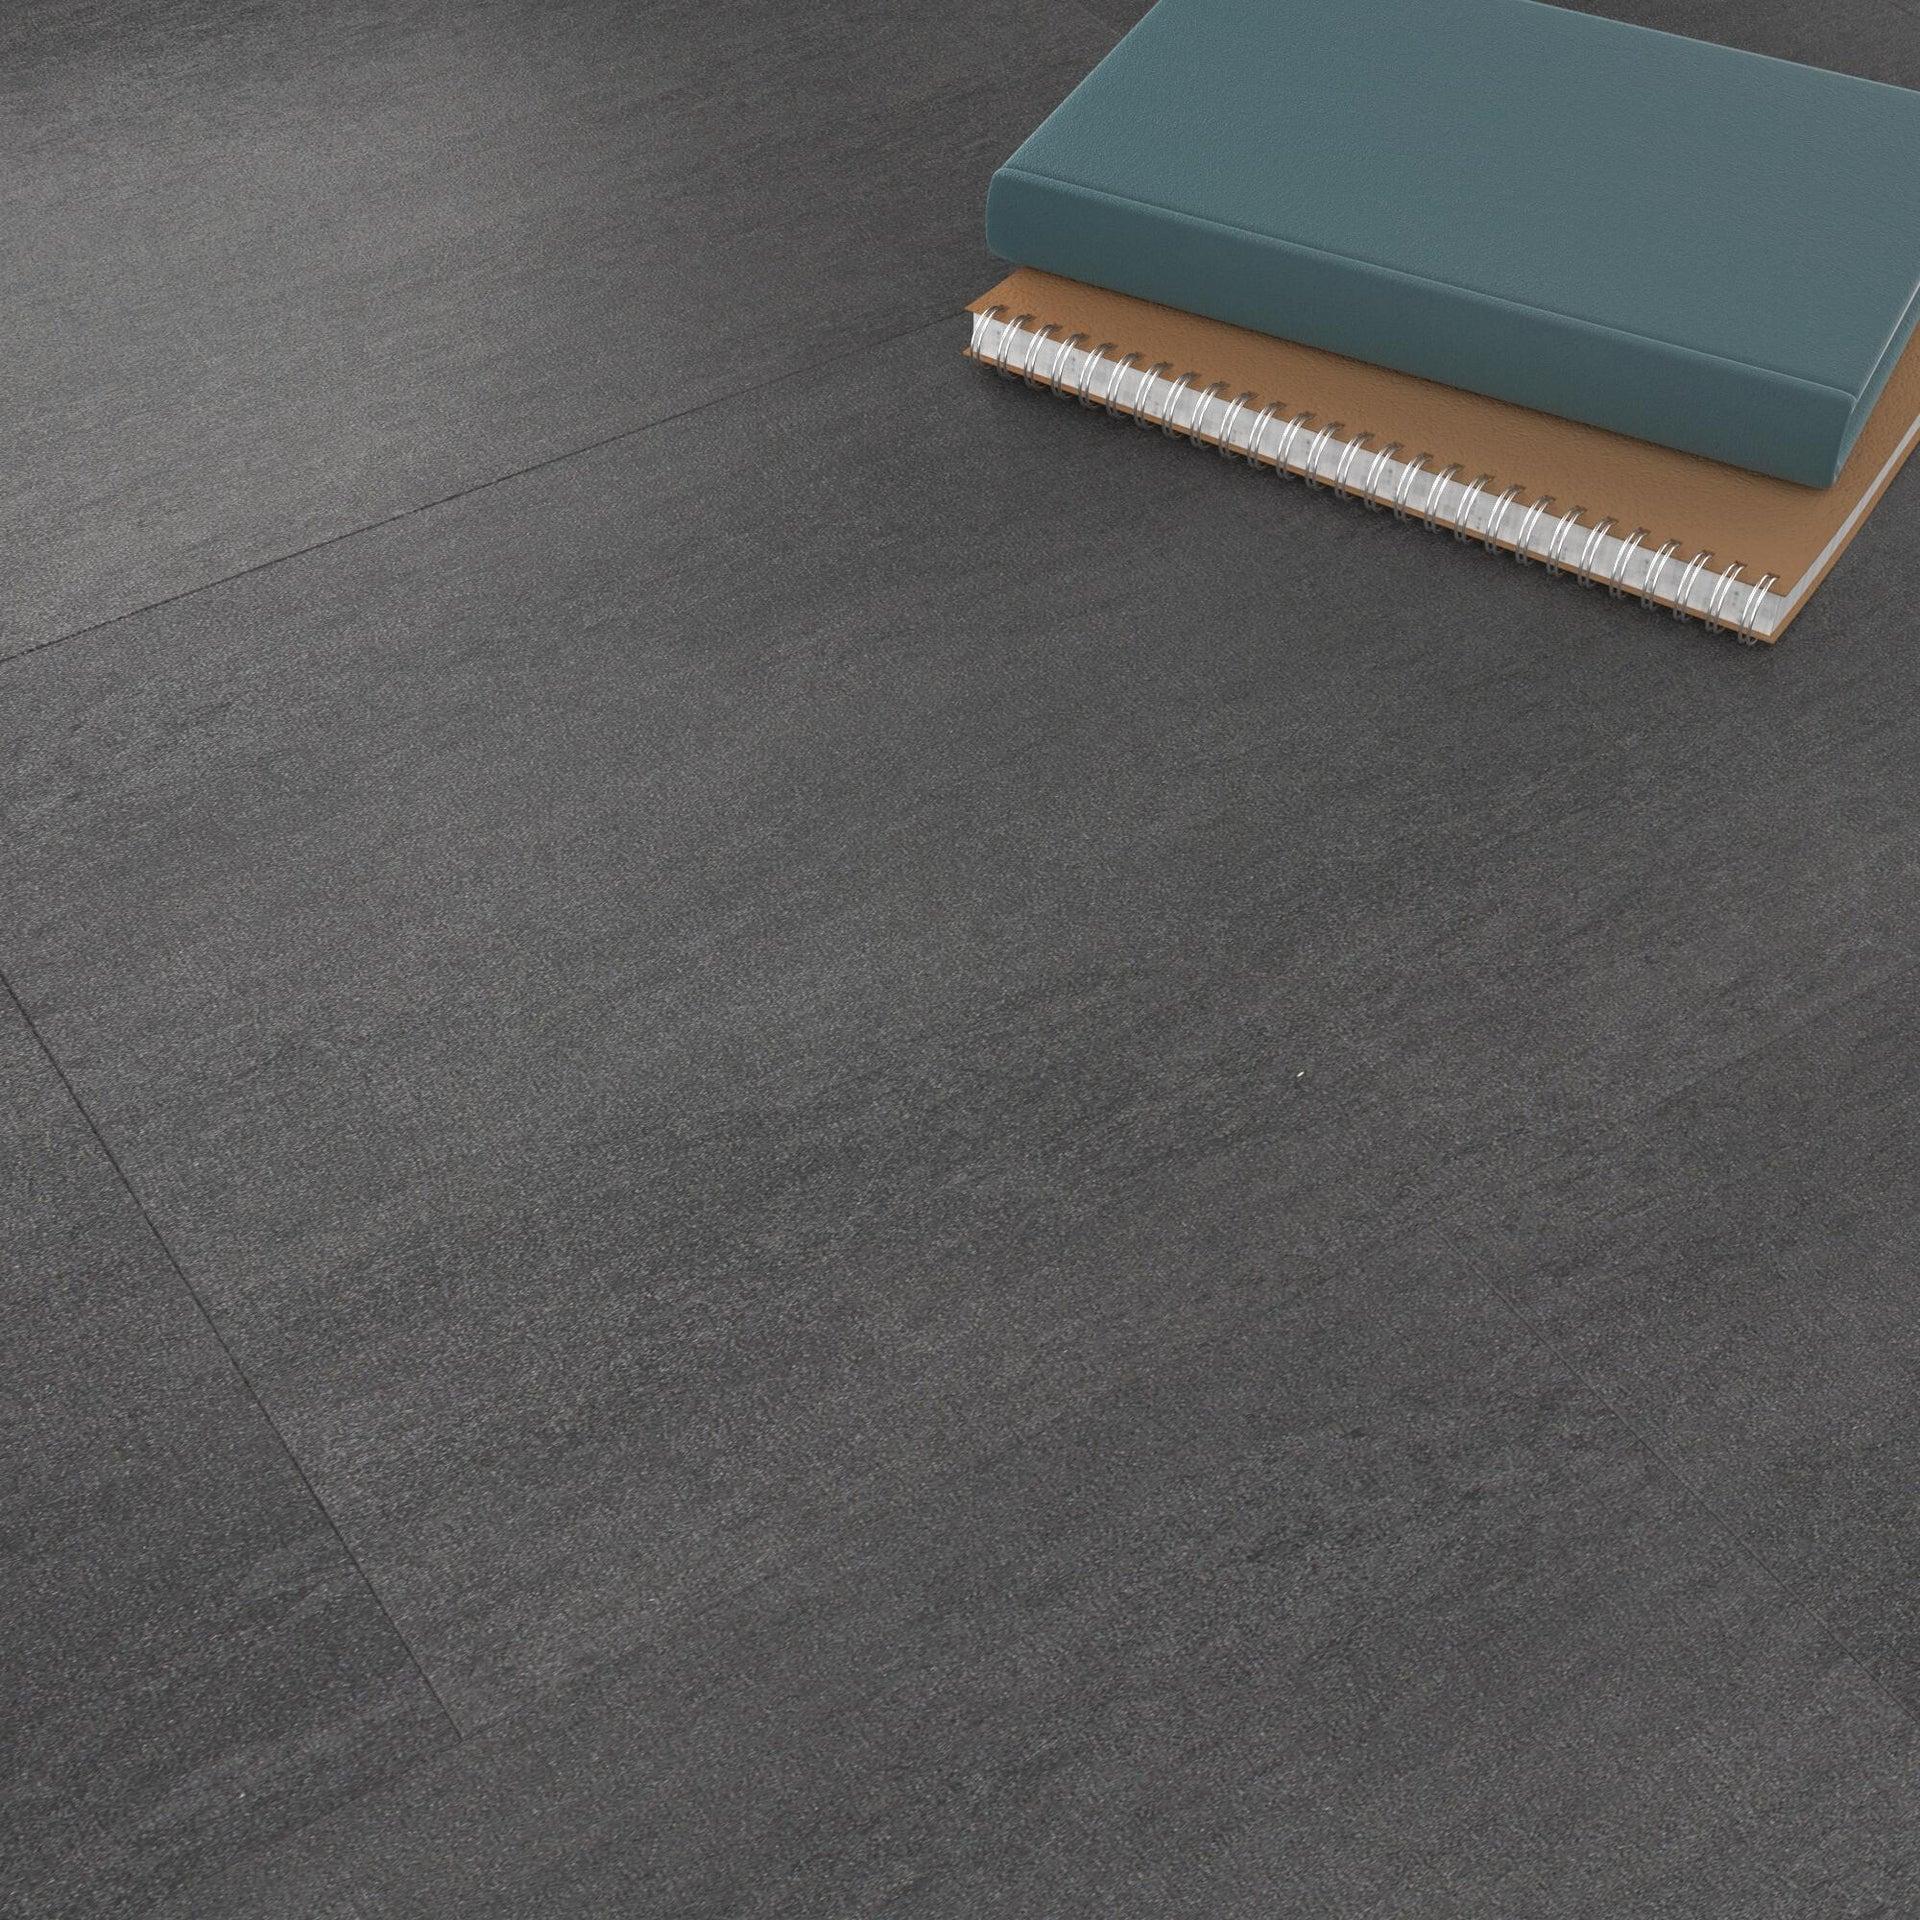 Pavimento PVC flottante clic+ Art For New Sp 4.2 mm nero - 4